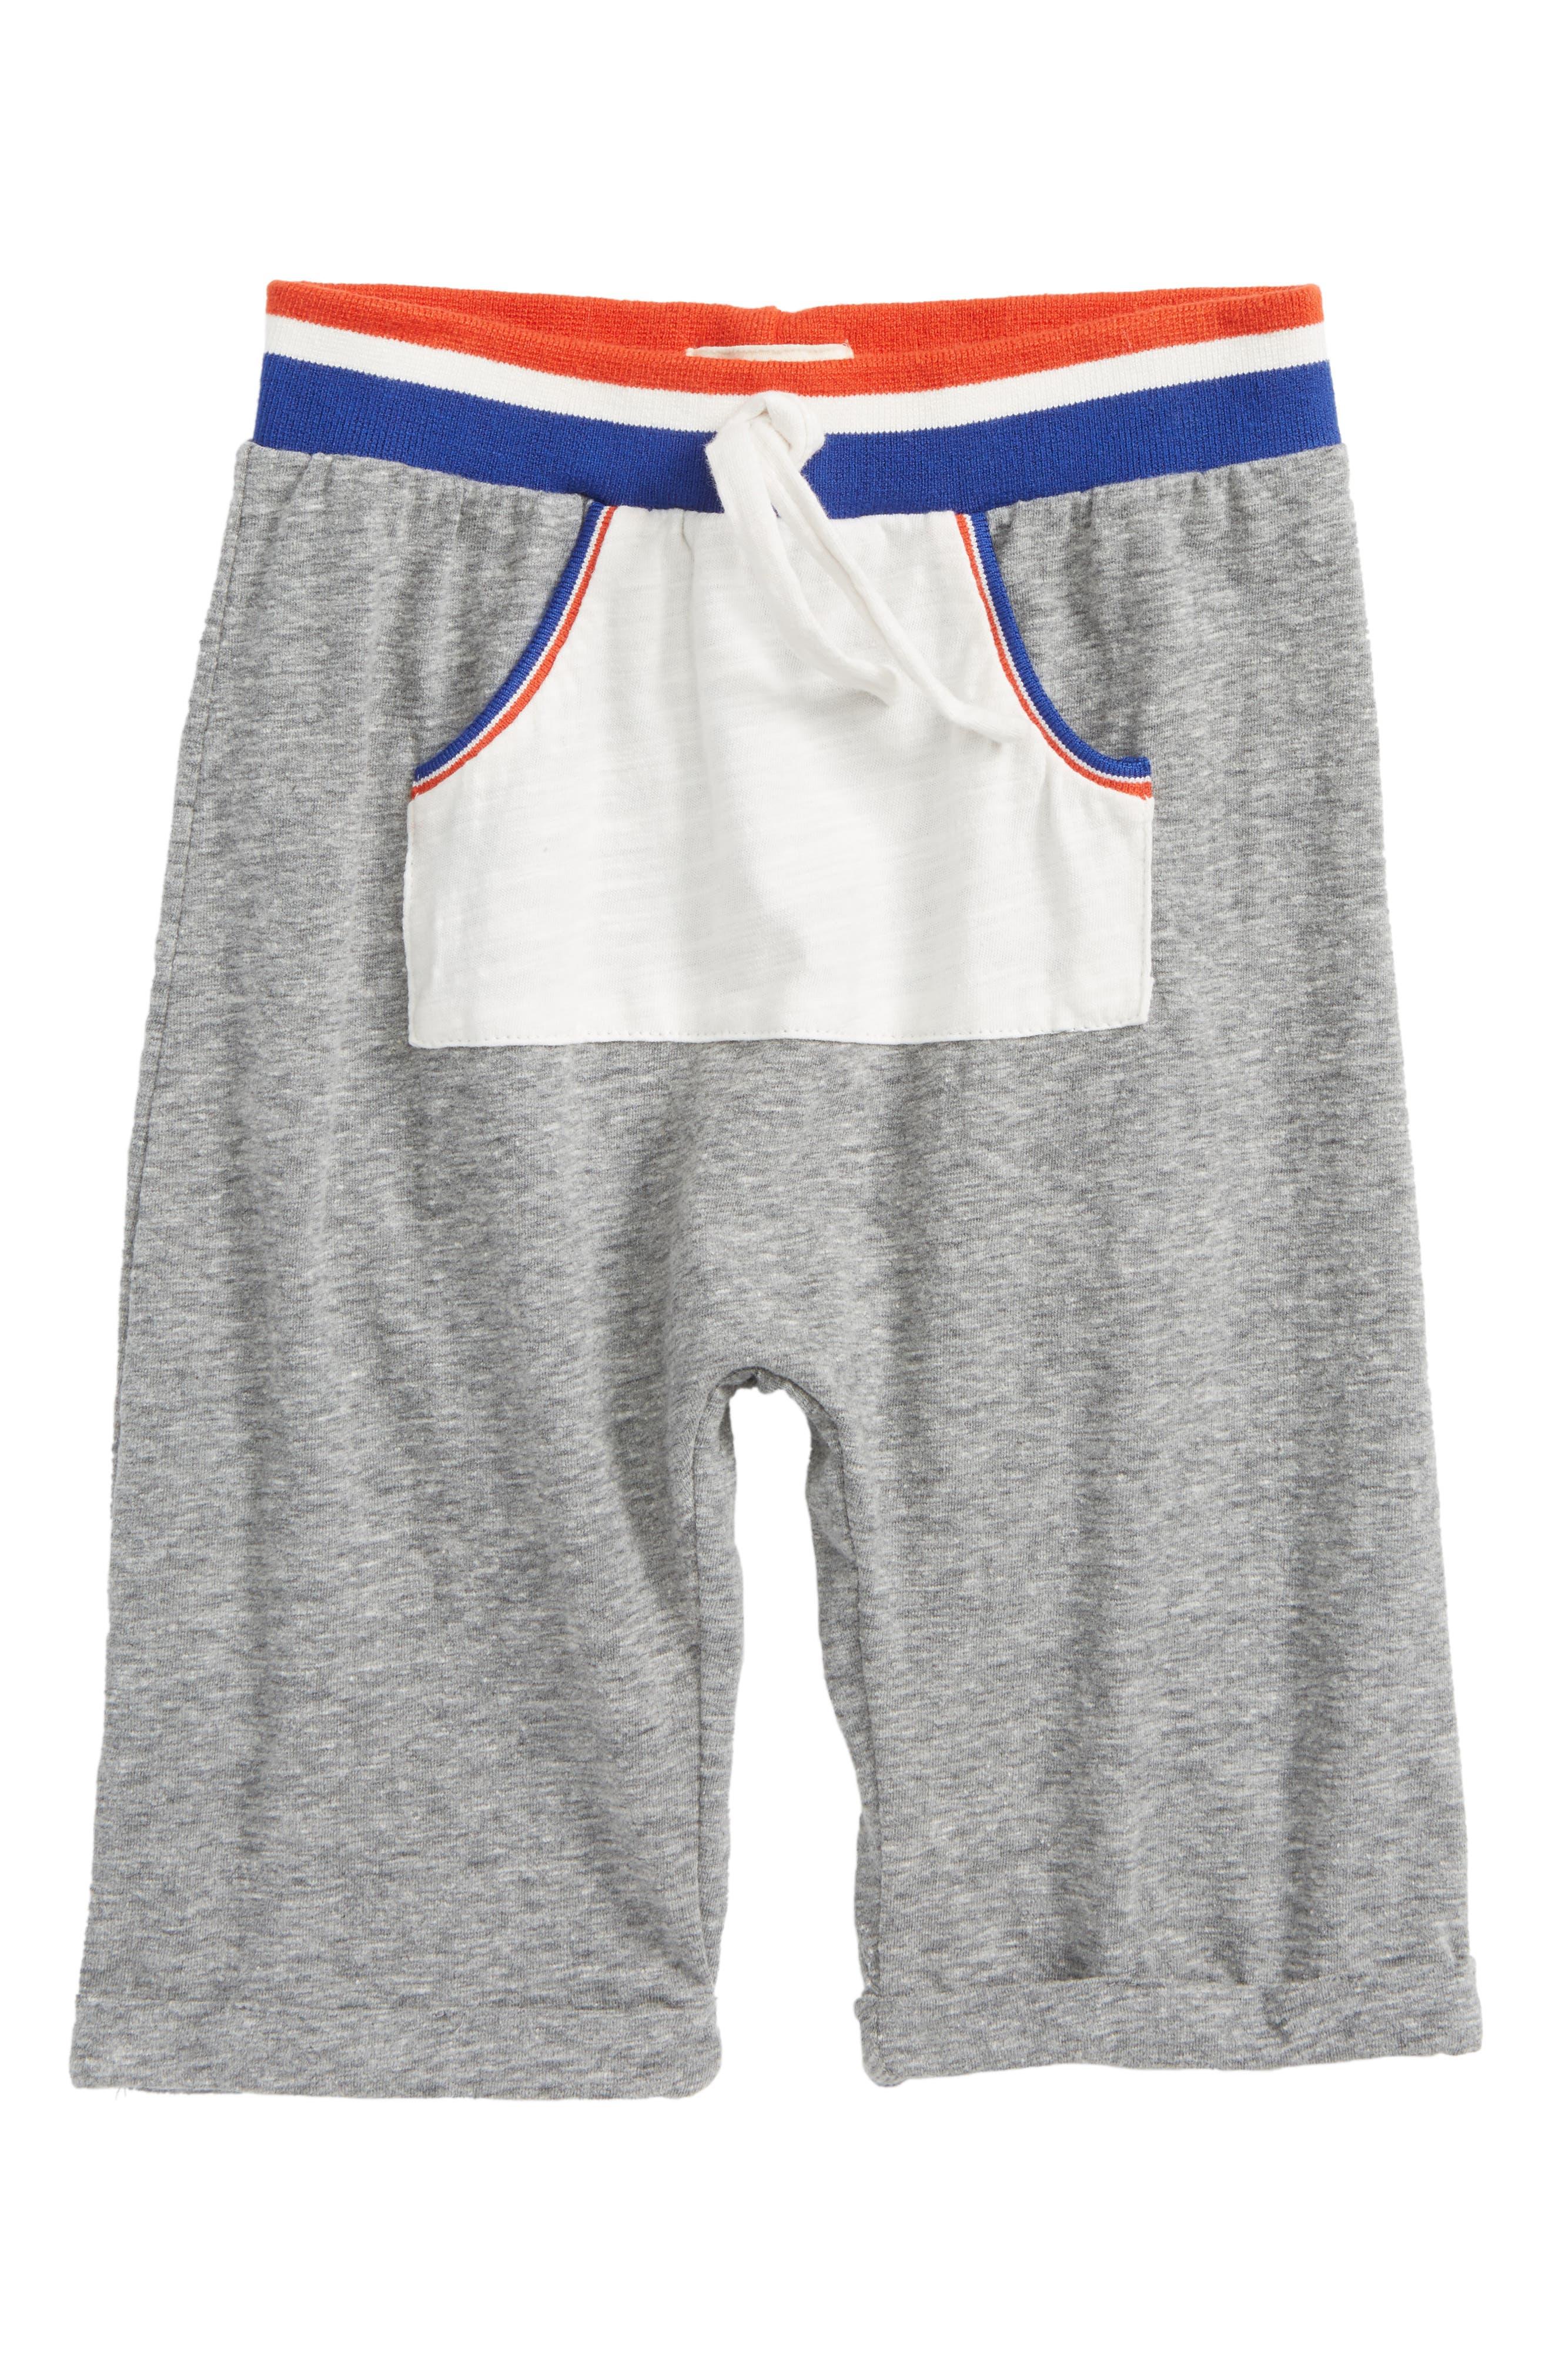 Cole Shorts,                         Main,                         color, 021